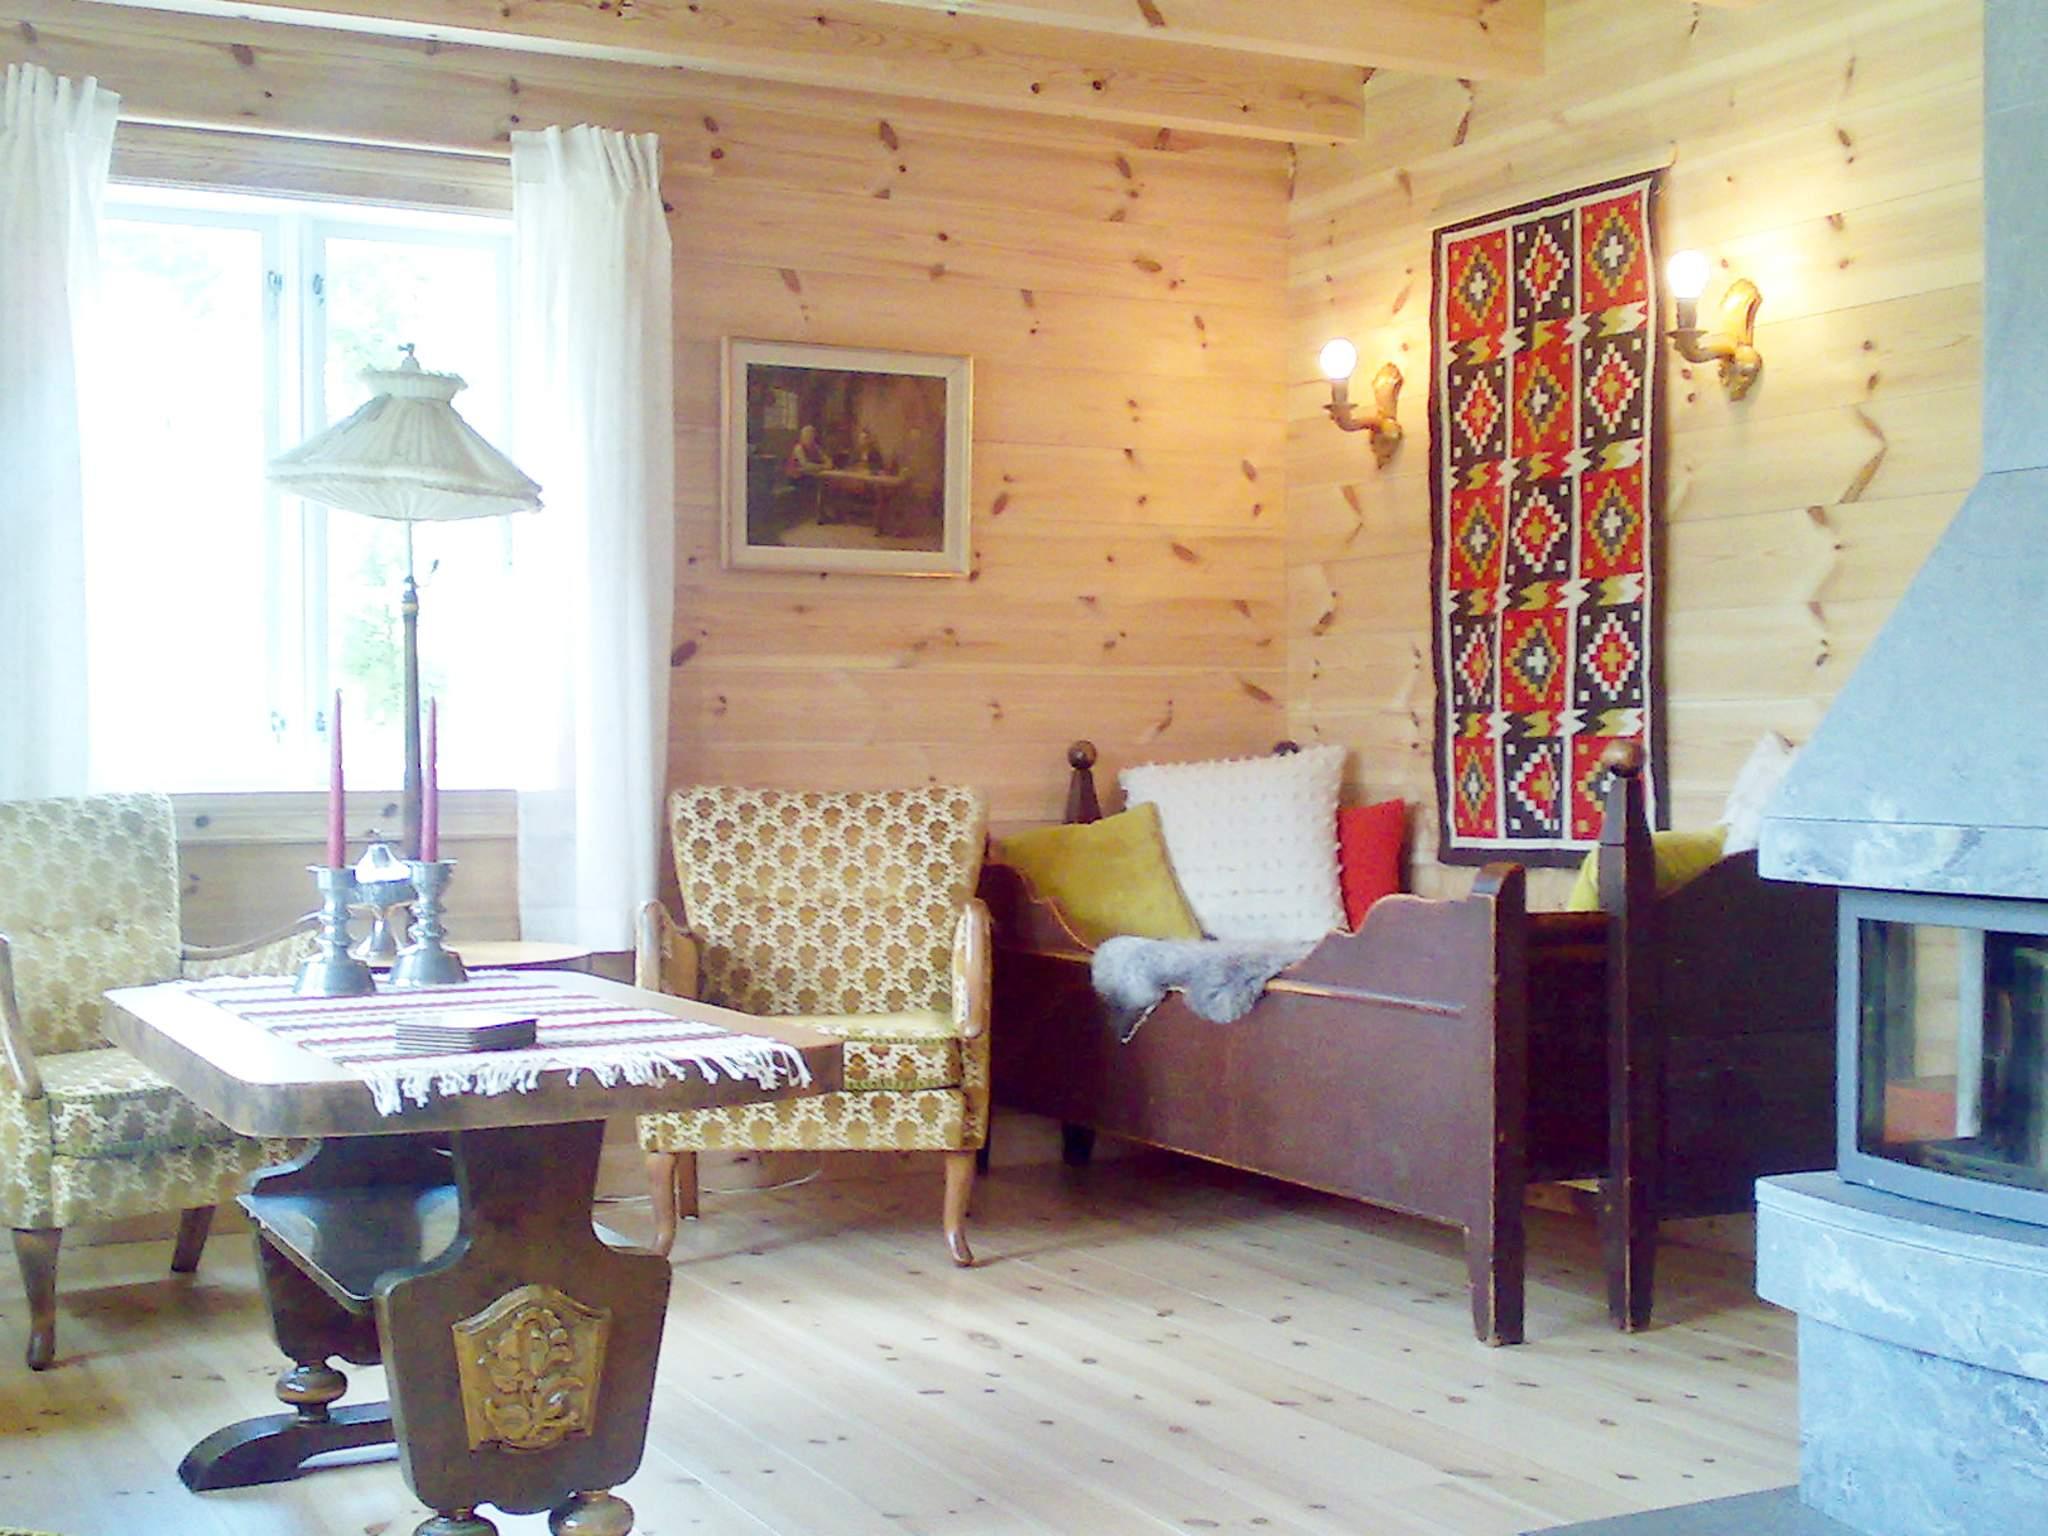 Ferienhaus Heskestad (252727), Ualand, Rogaland - Boknalfjord, Westnorwegen, Norwegen, Bild 2